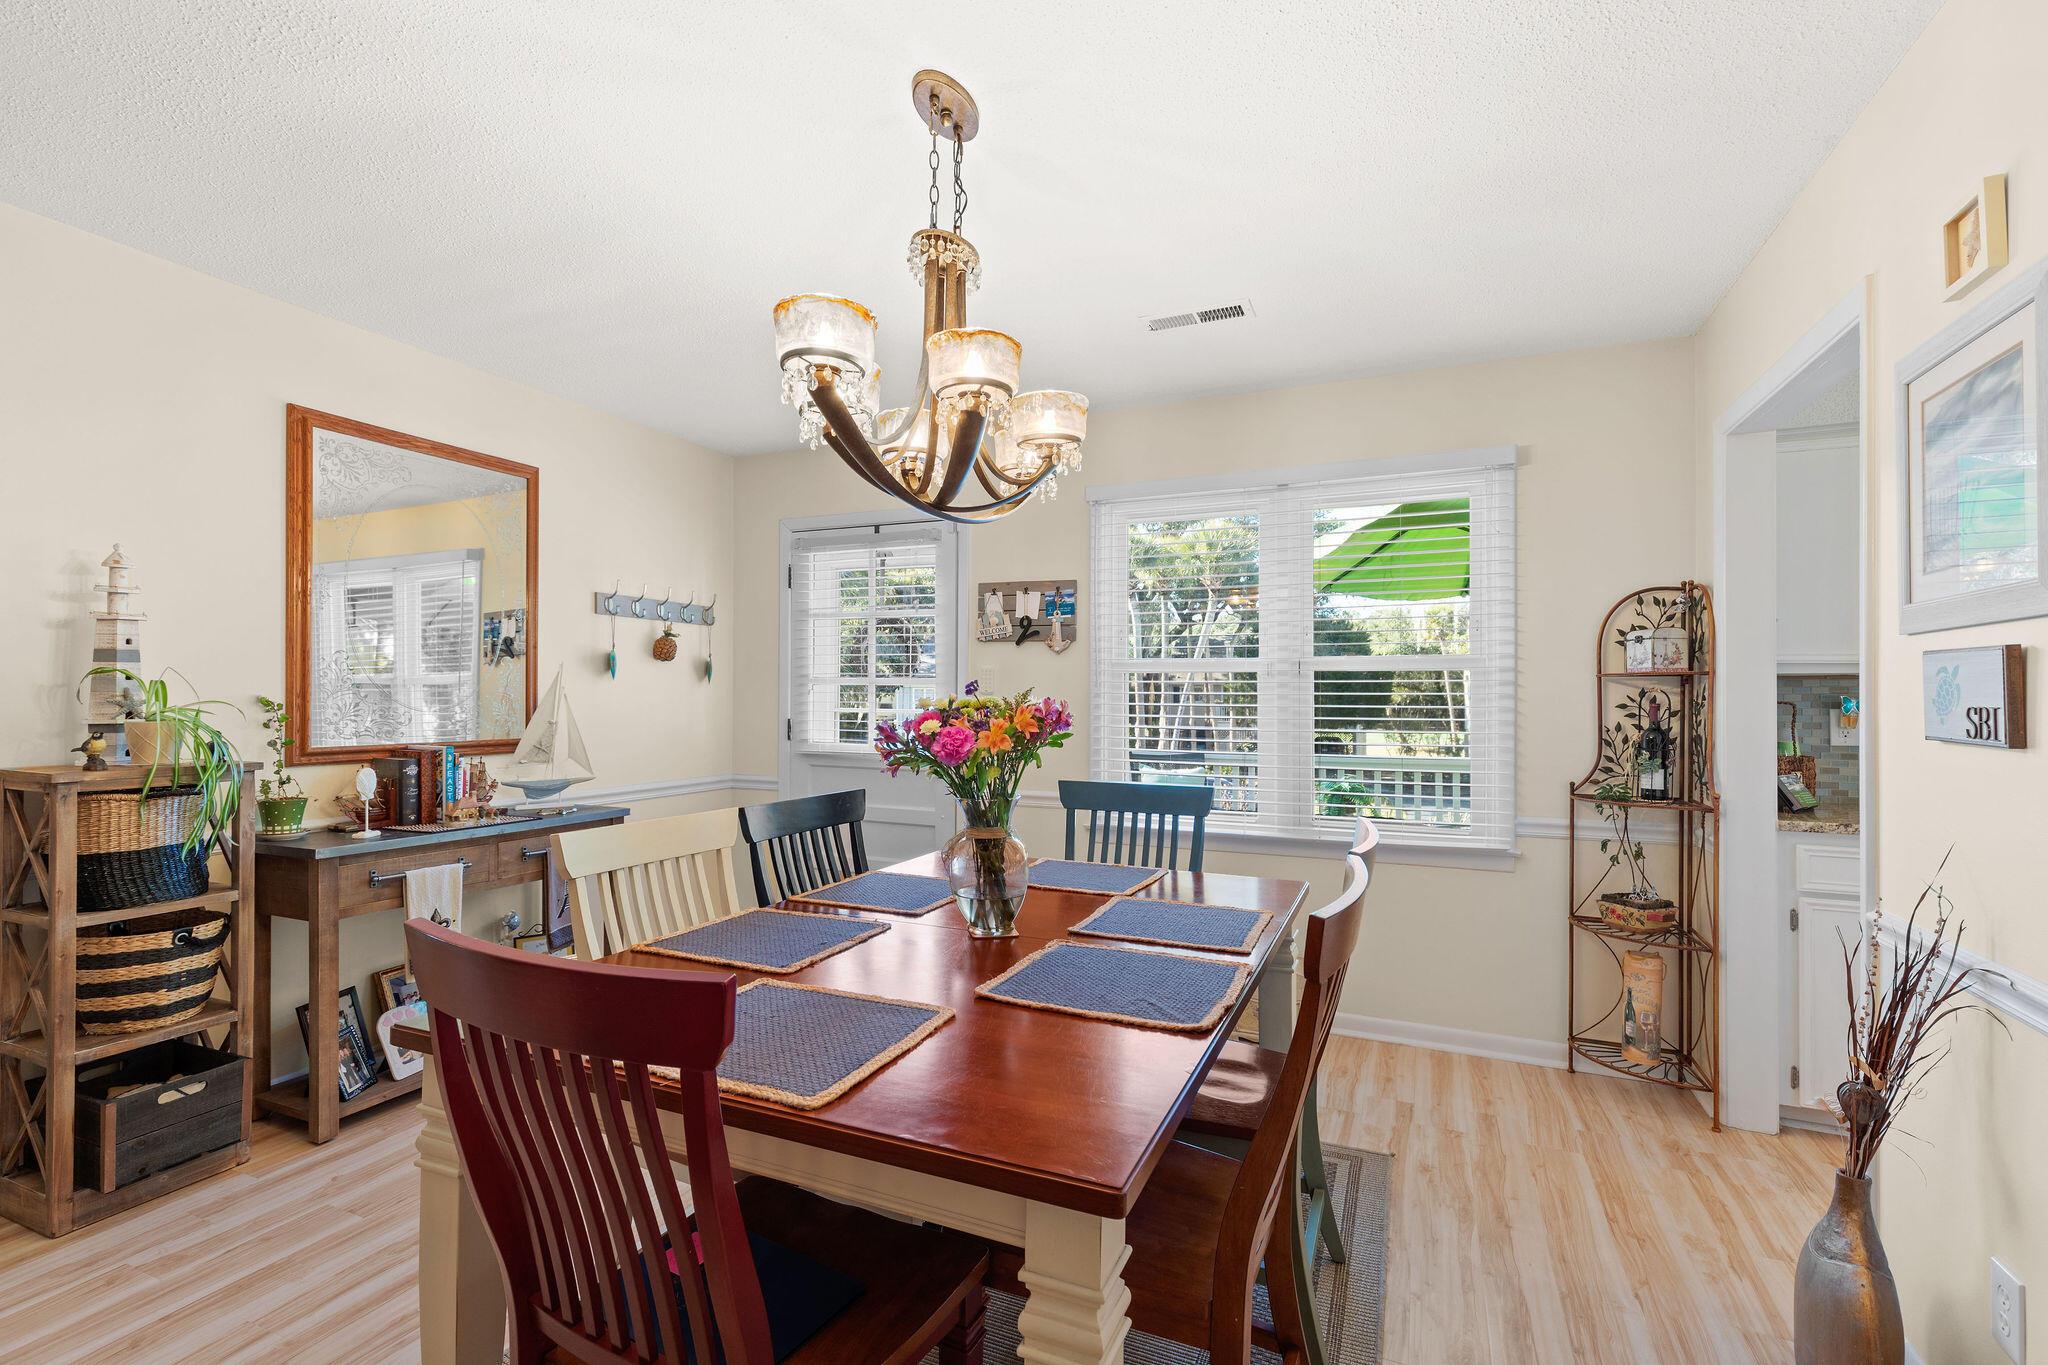 Seabrook Island Homes For Sale - 515 Cobby Creek, Seabrook Island, SC - 49